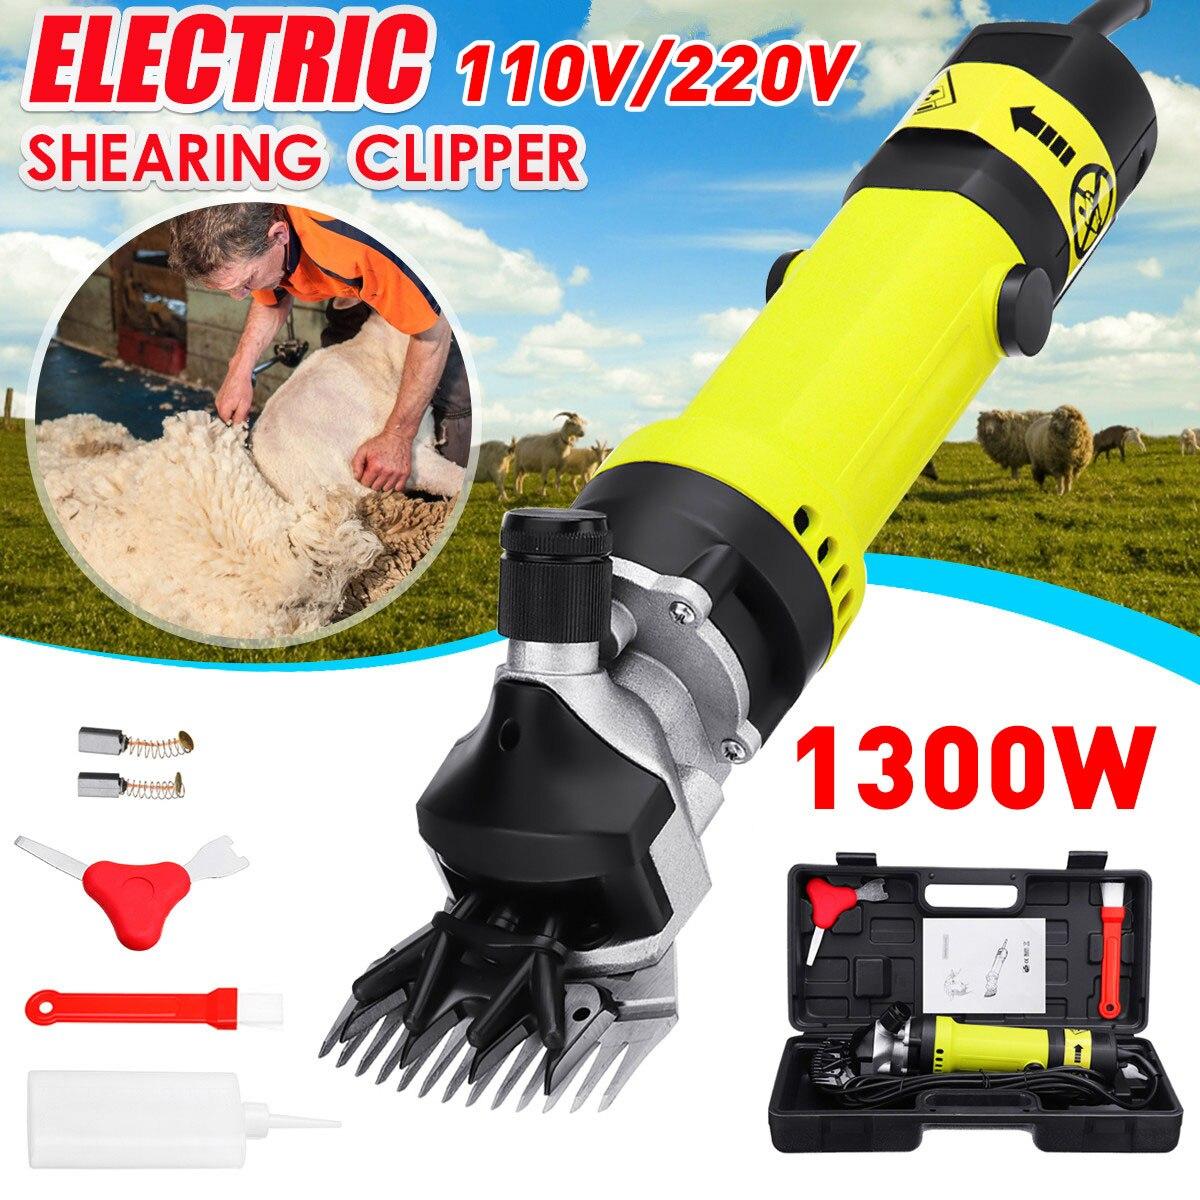 Dirllpro 1300W Electric Sheep Pet Hair Clipper Shearing Kit Shear Wool Cut Goat Pet Animal Shearing Supplies Farm Cut Machine